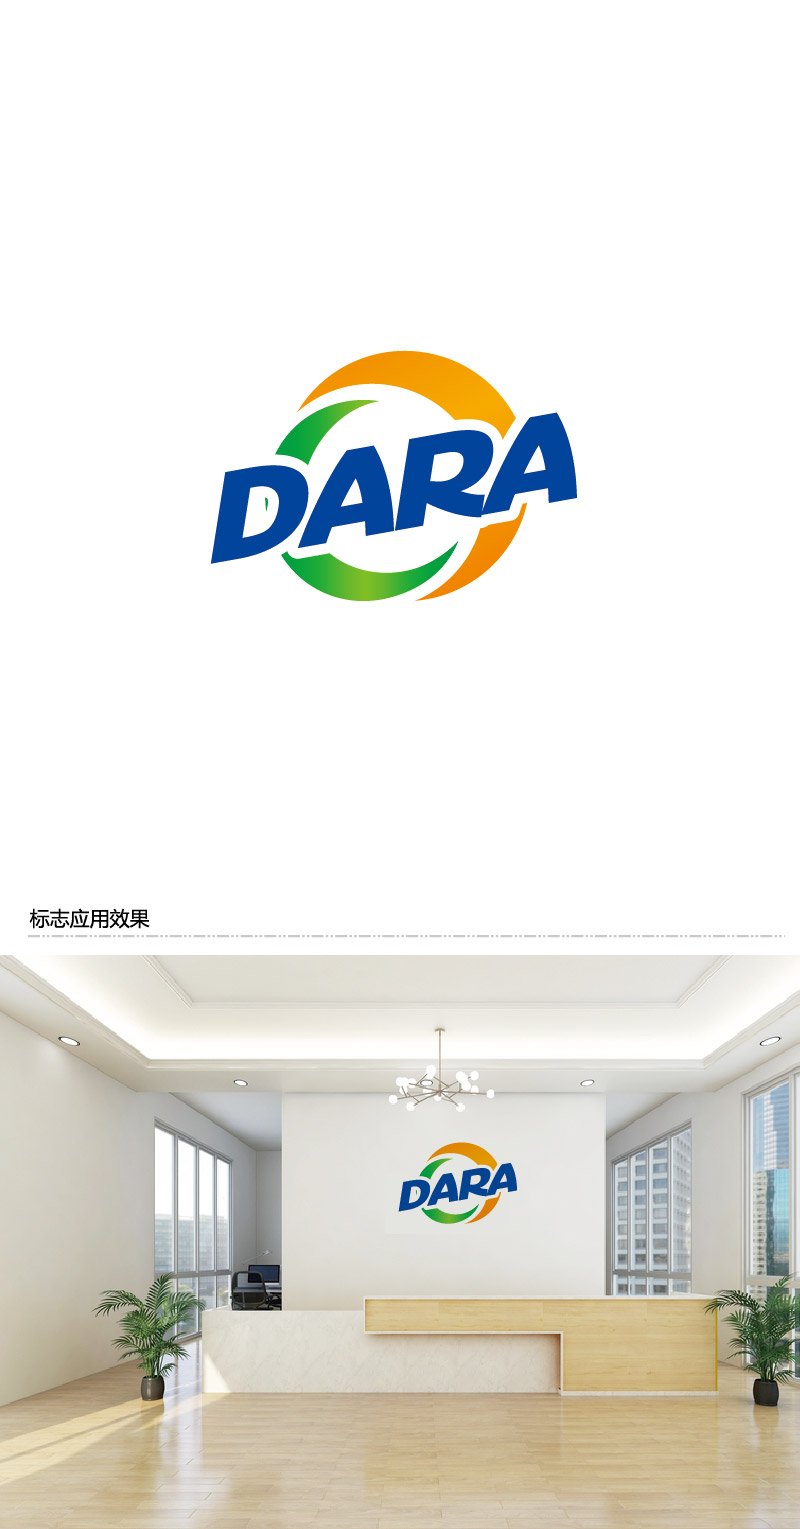 DARA  logo设计_3034696_k68威客网